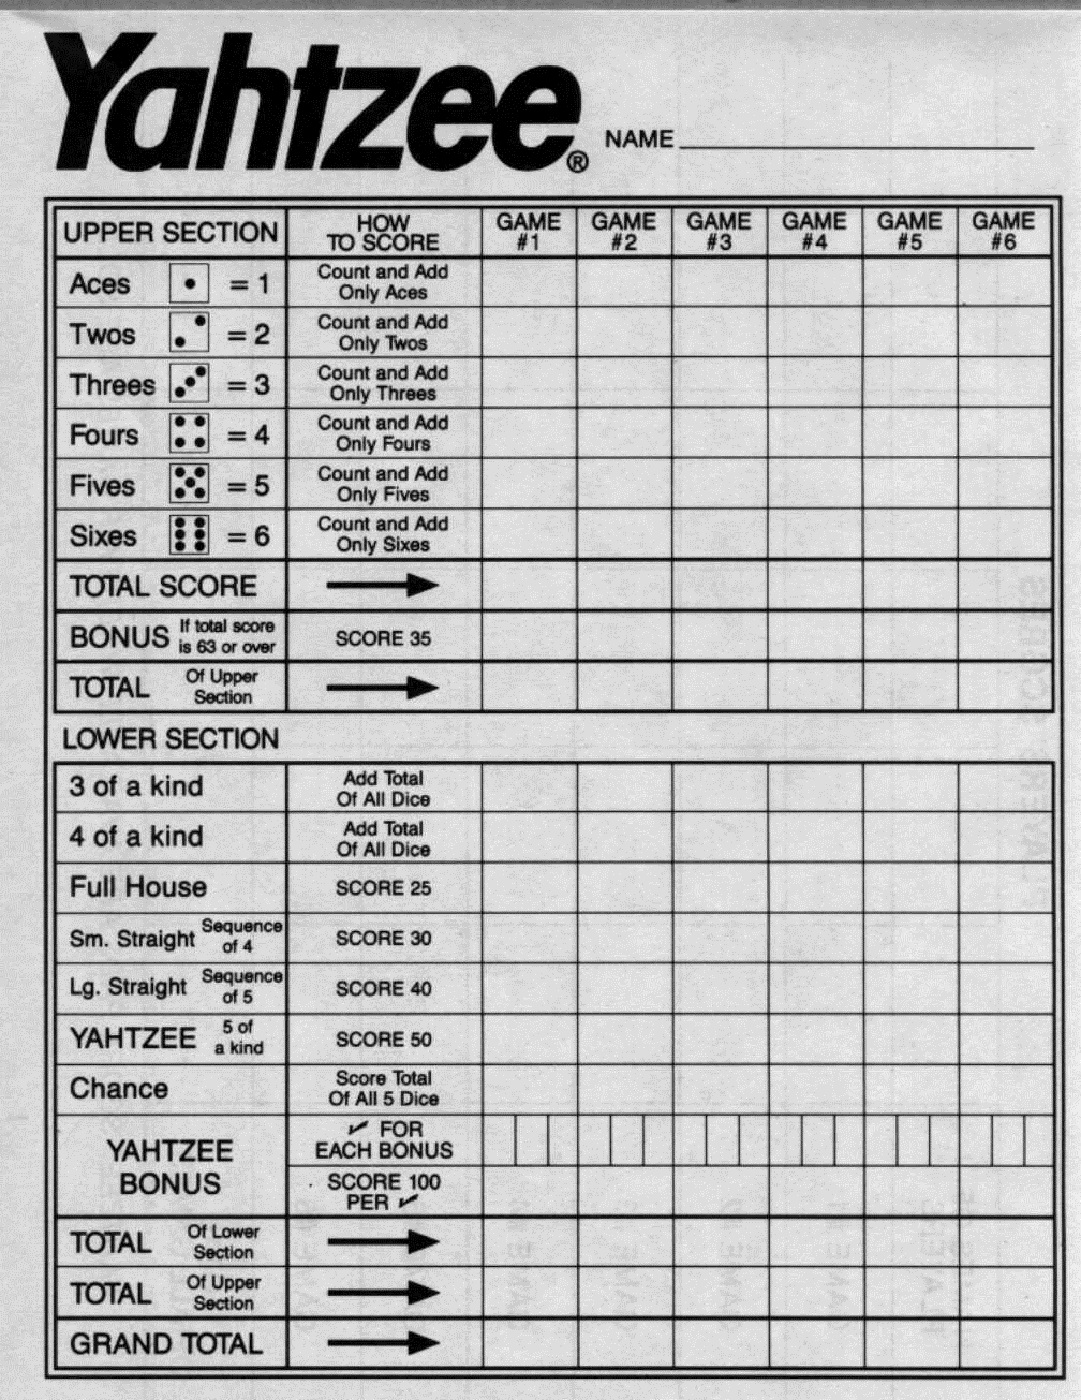 photo about Yahtzee Score Sheets Printable named Yahtzee Rating Sheets - Resume Illustrations Resume Template